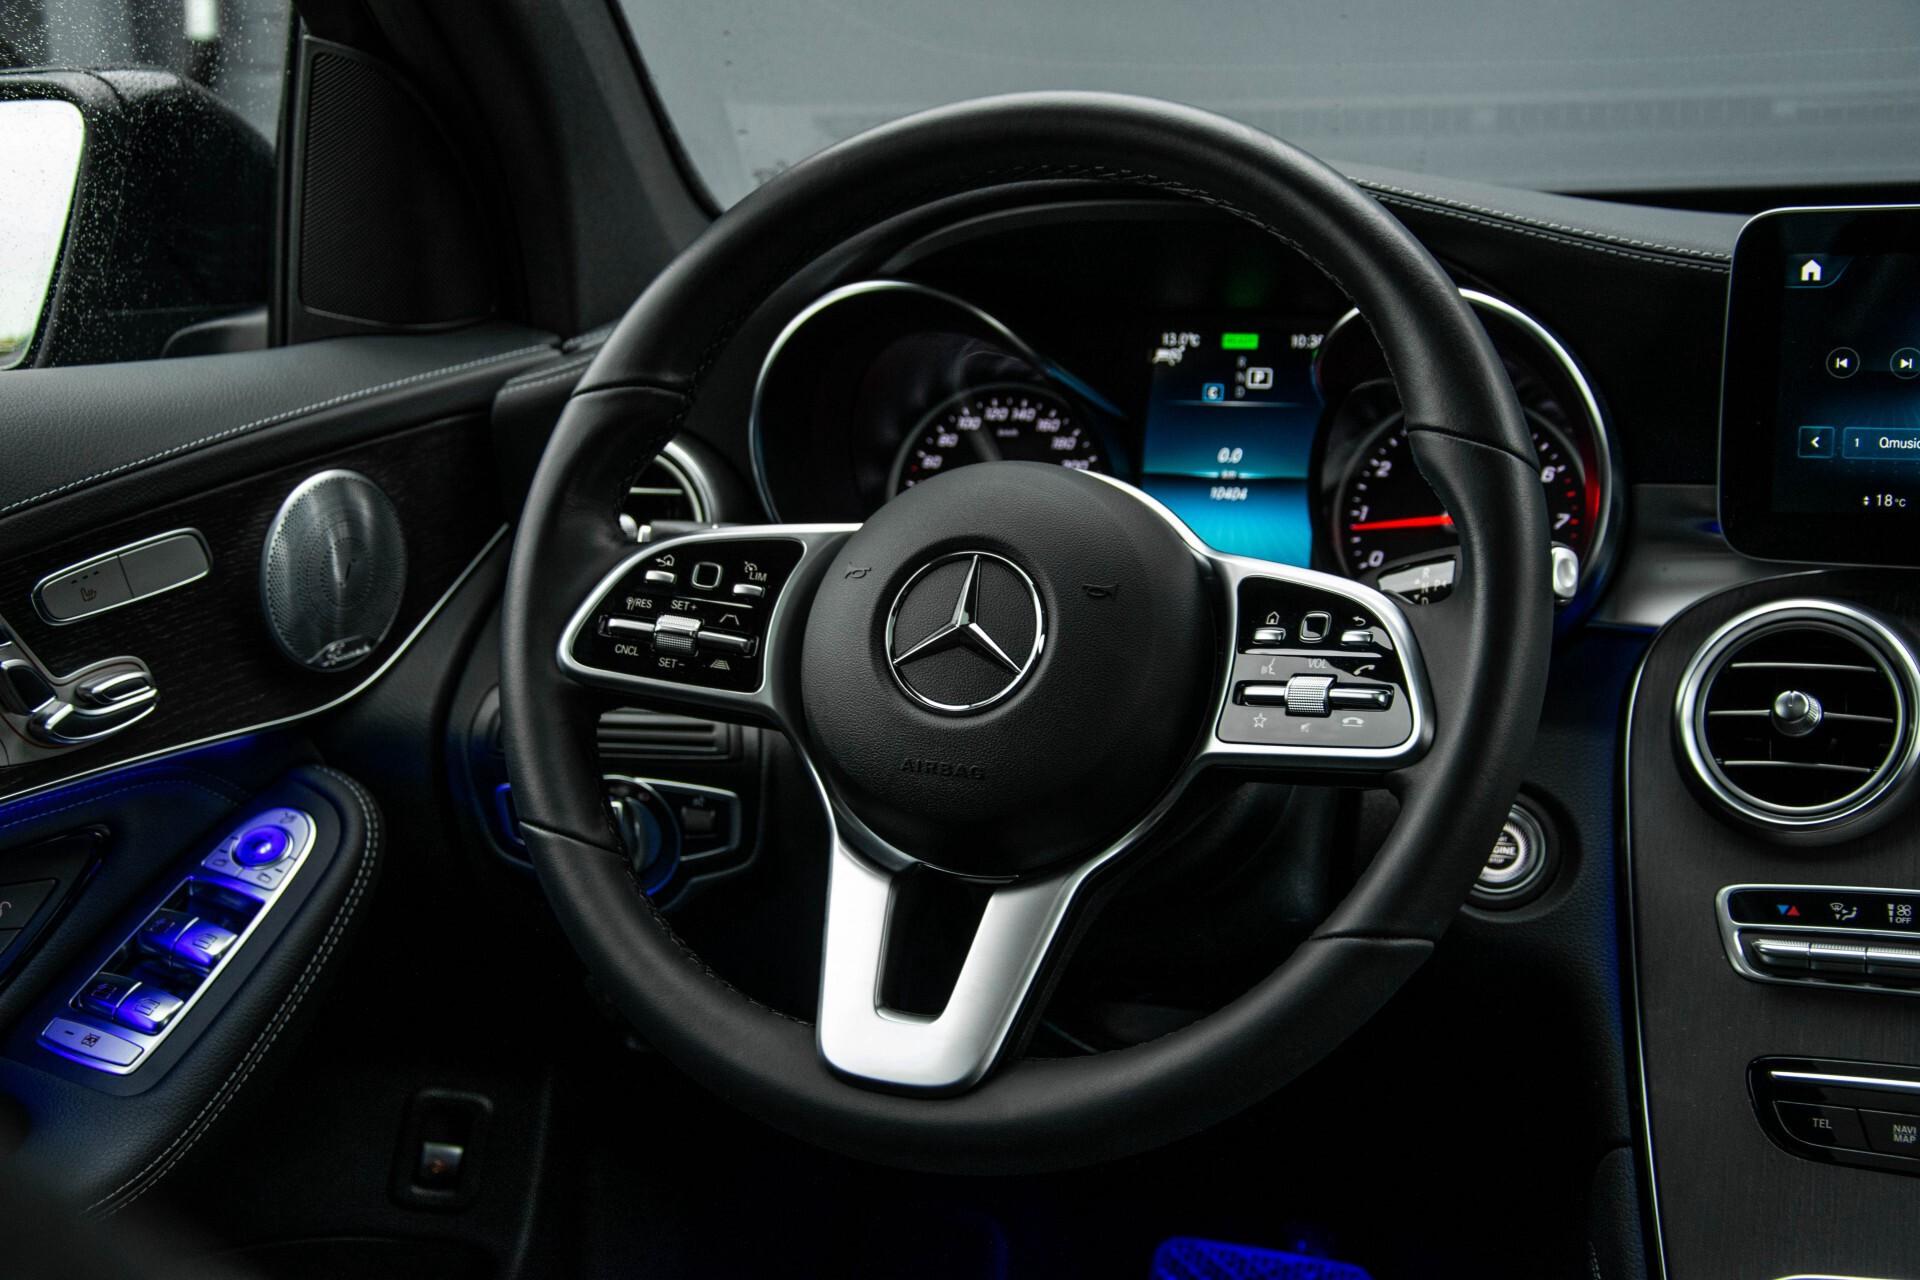 Mercedes-Benz GLC 200 4-M AMG Night/Panorama/Distronic Pro/Burmester/360camera/Exclusive Aut9 Foto 6